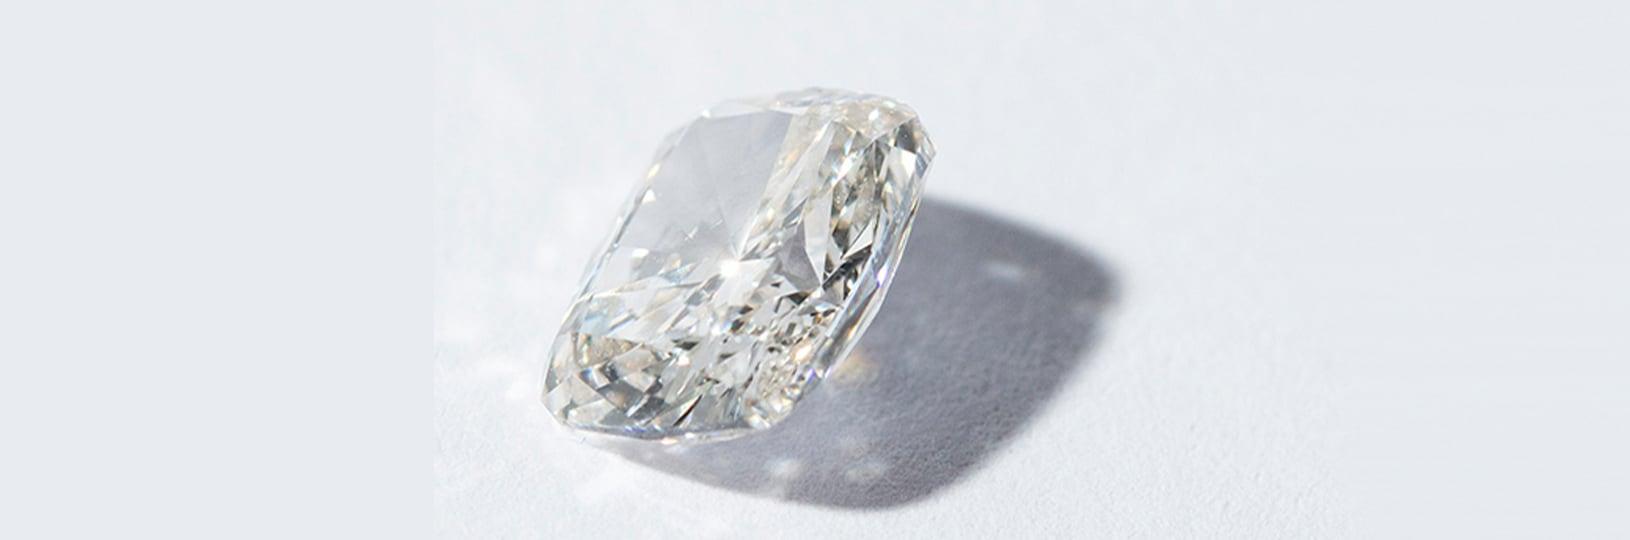 Image of a loose Nexus Diamond™ alternative